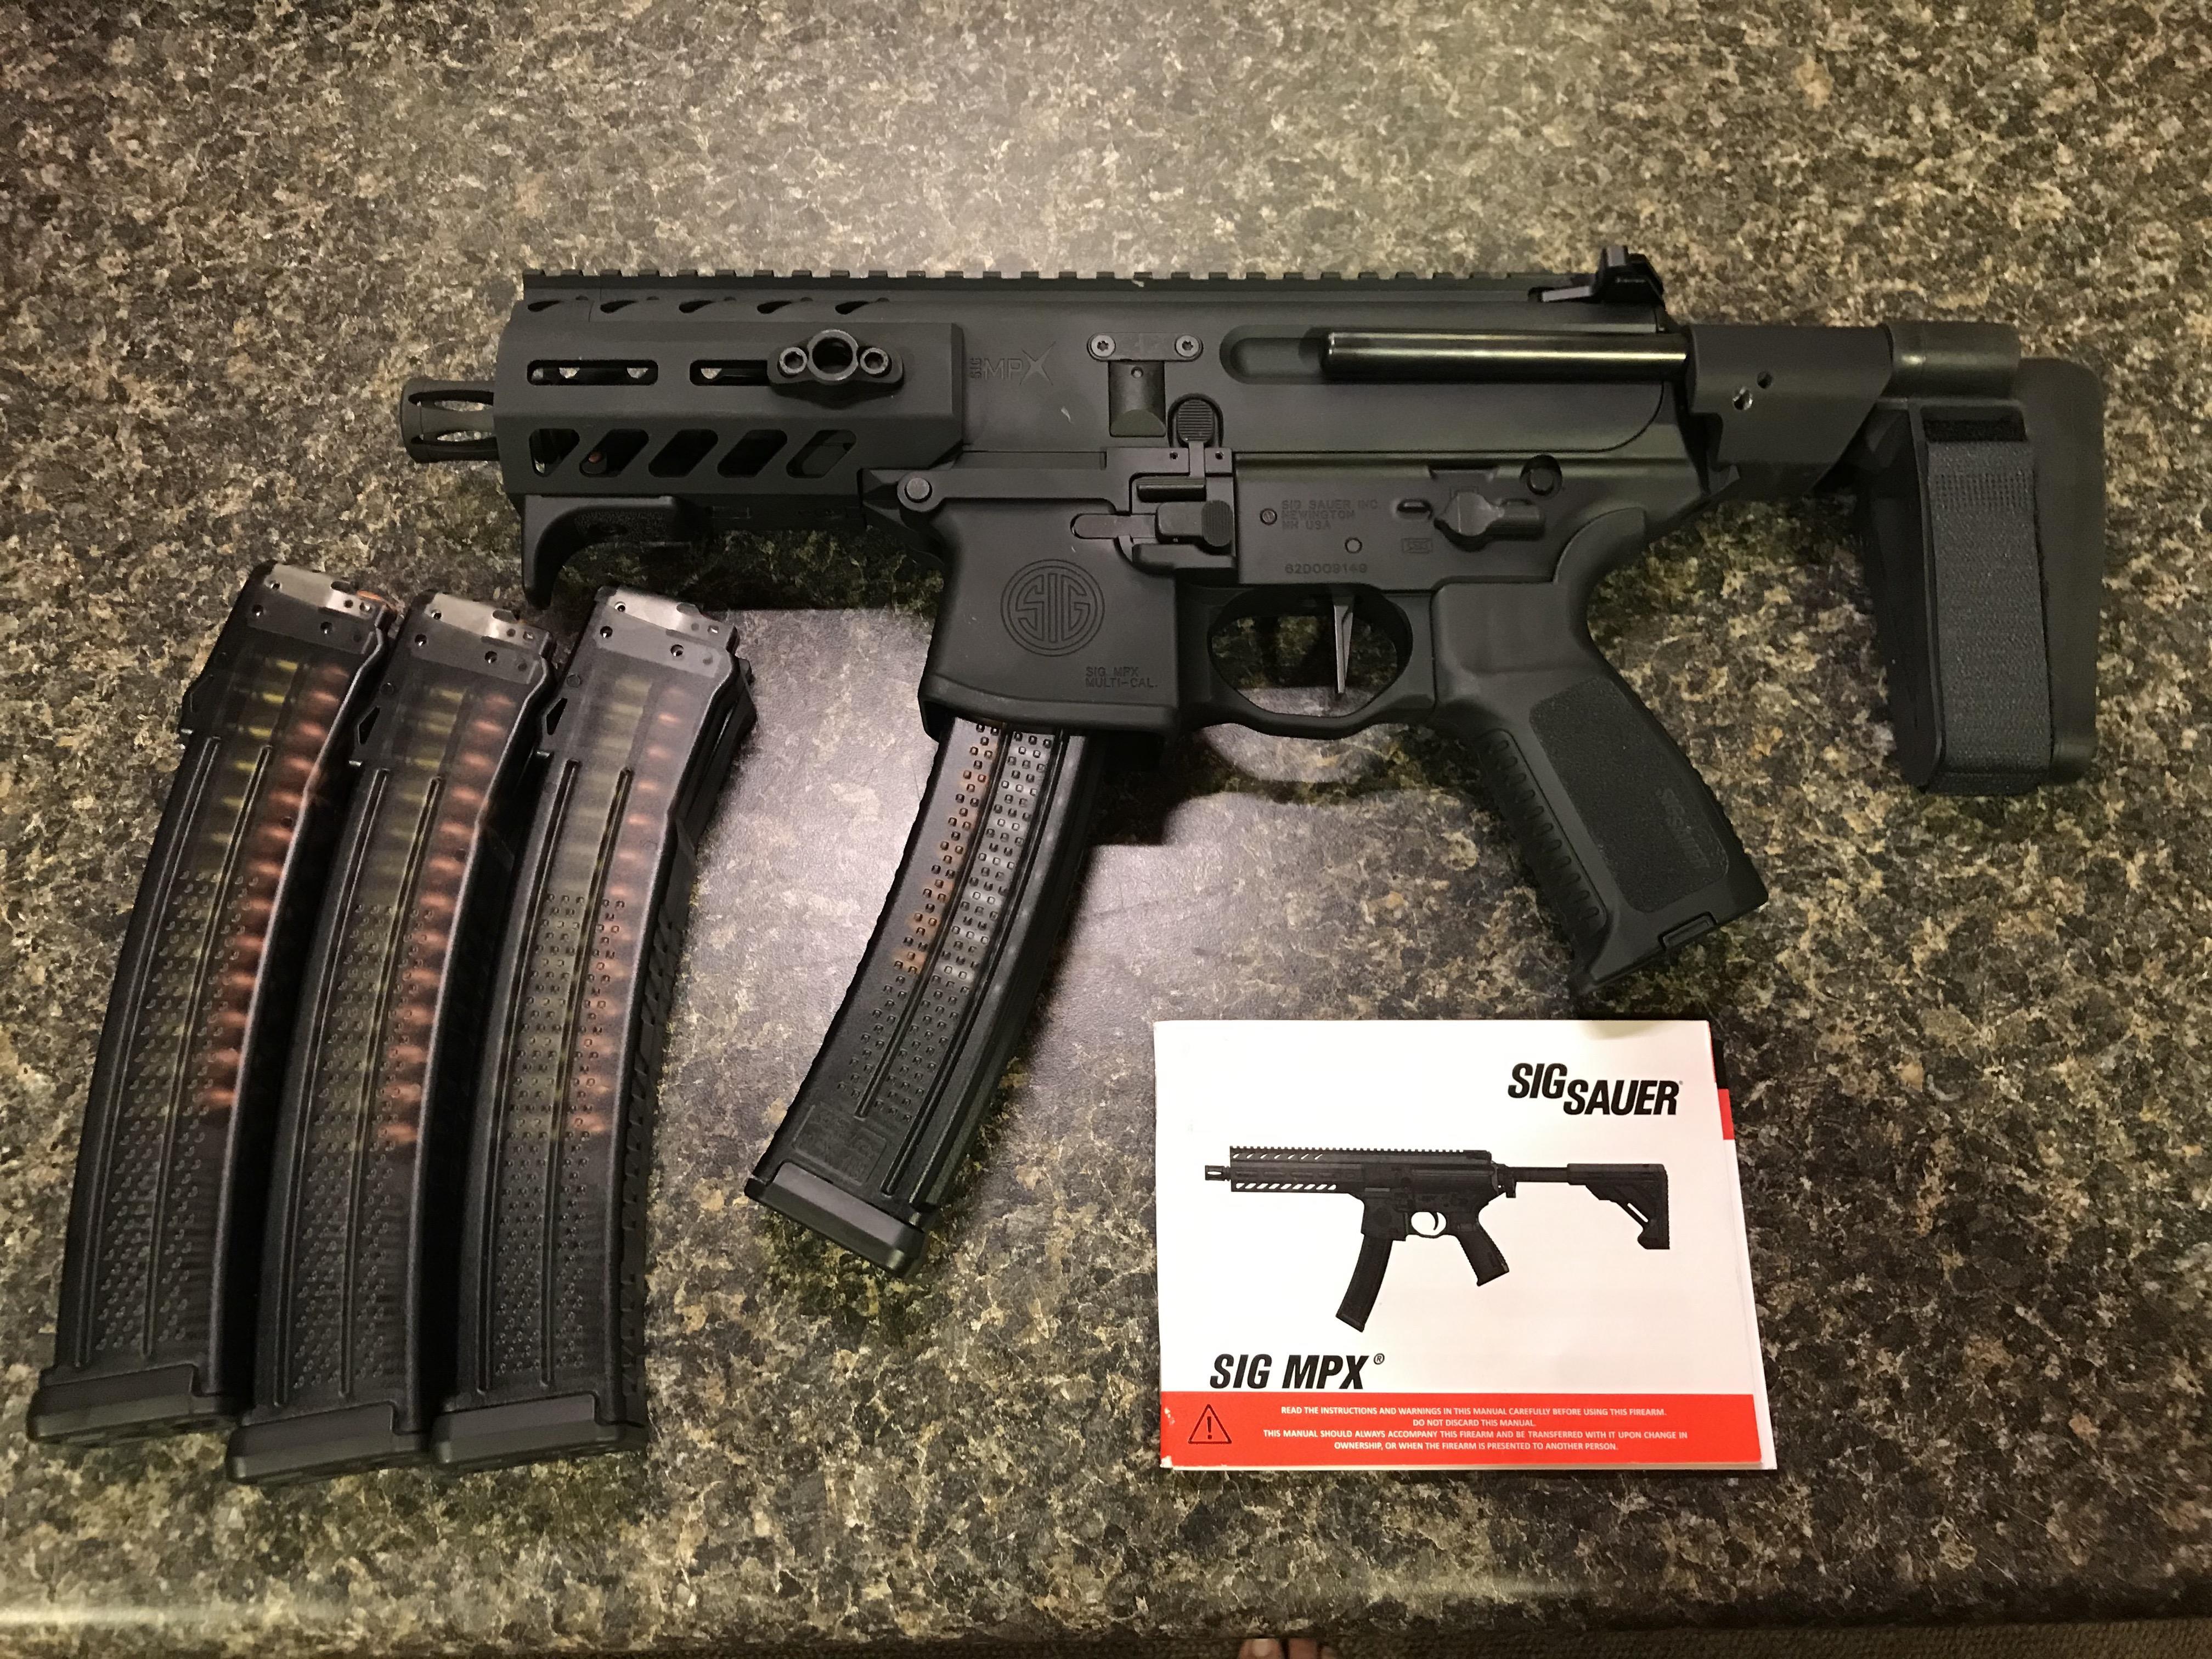 WTS:  SIG MPX-K 9mm Pistol-03cb2b43-3198-4fb3-b3d6-2b82a4b0e9a3.jpeg